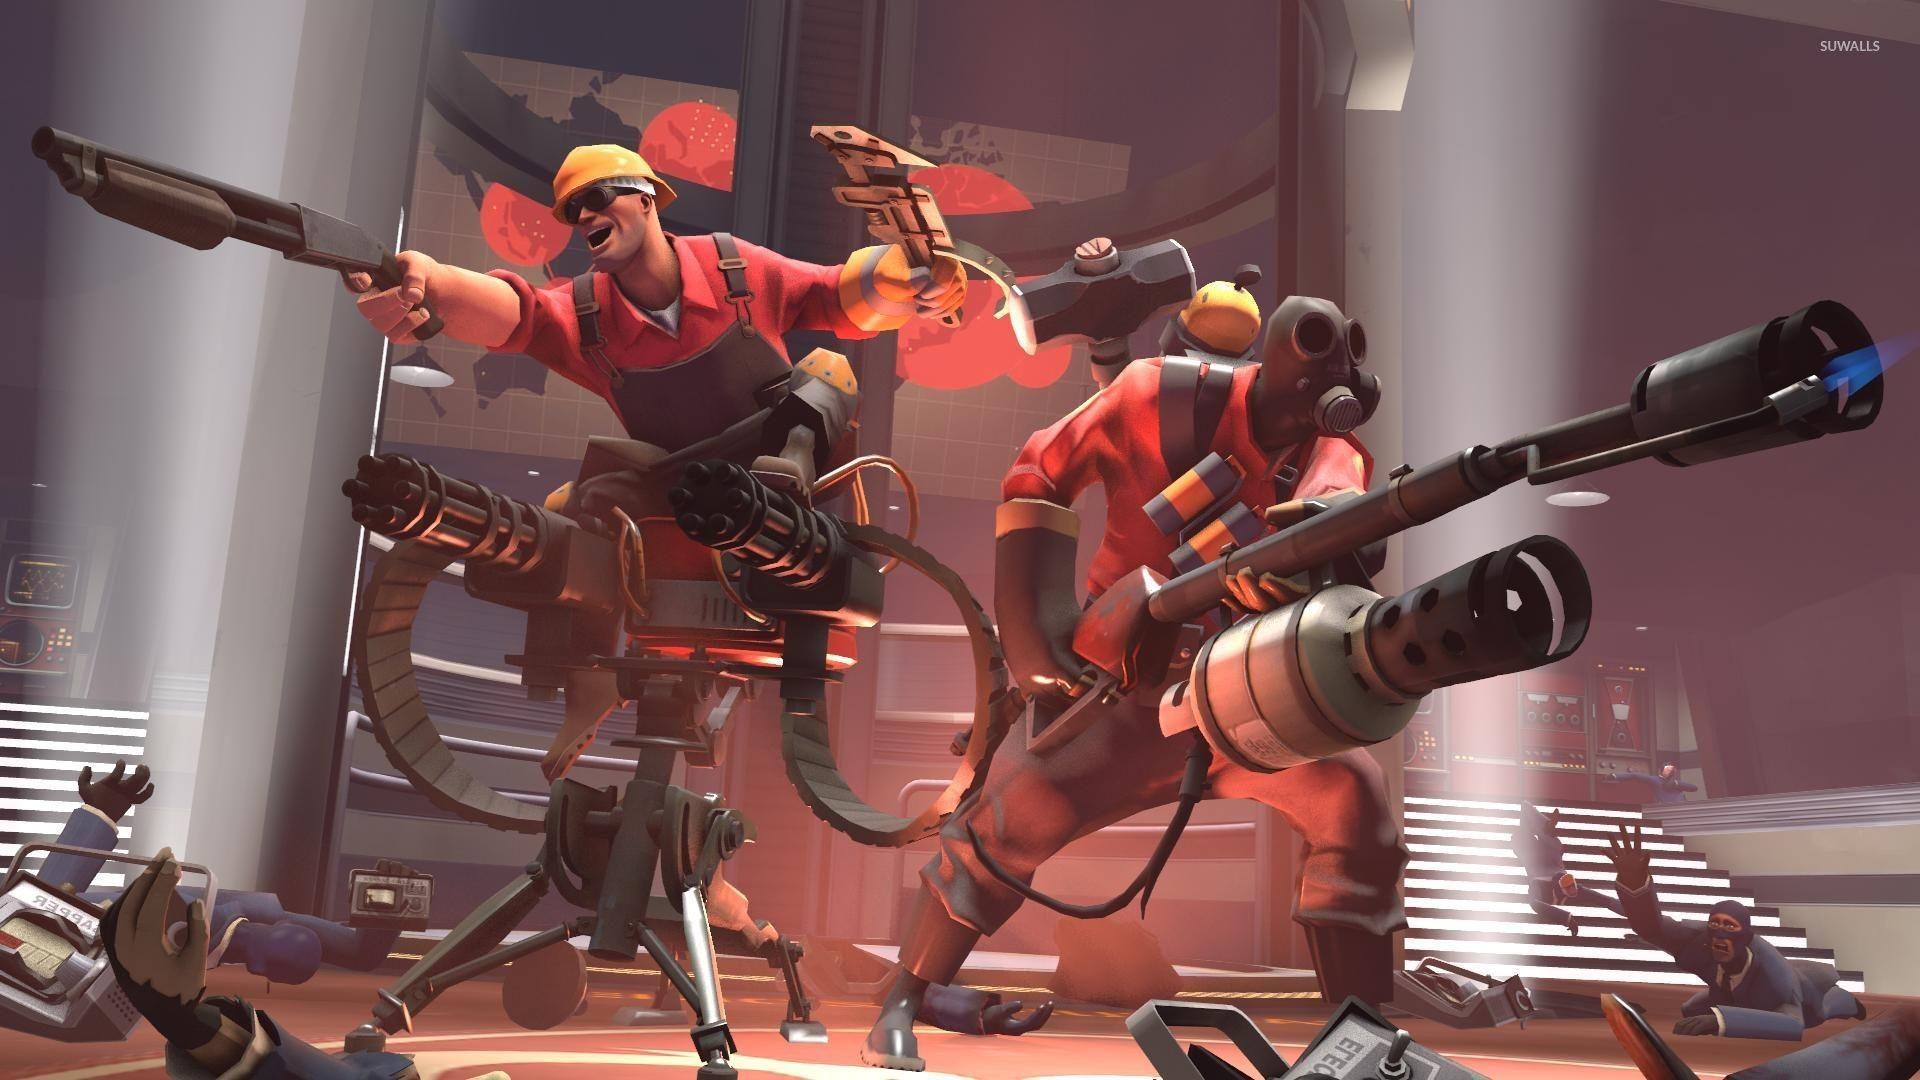 Team Fortress 2 [9] wallpaper jpg